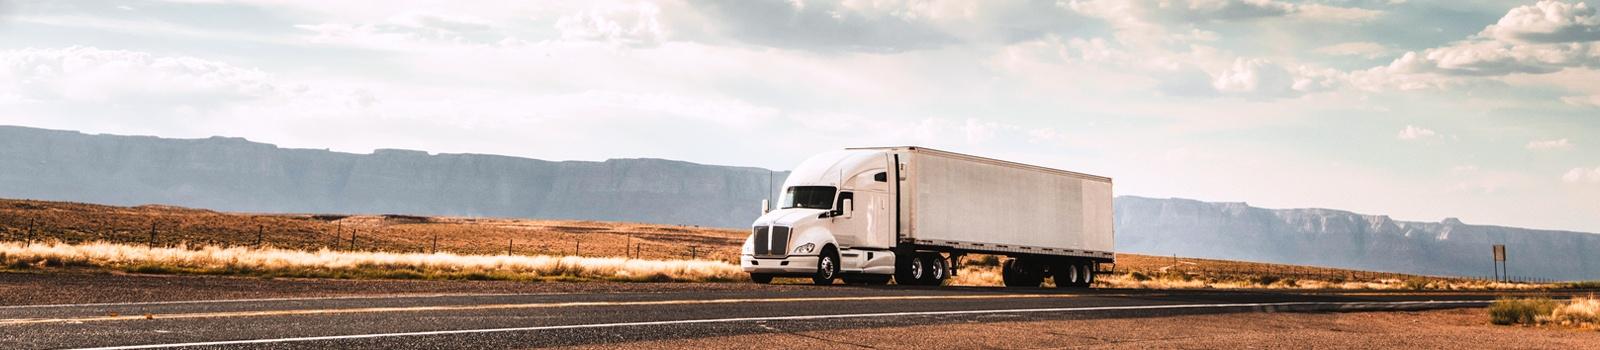 Transportation White Semi Truck Highway Approaching